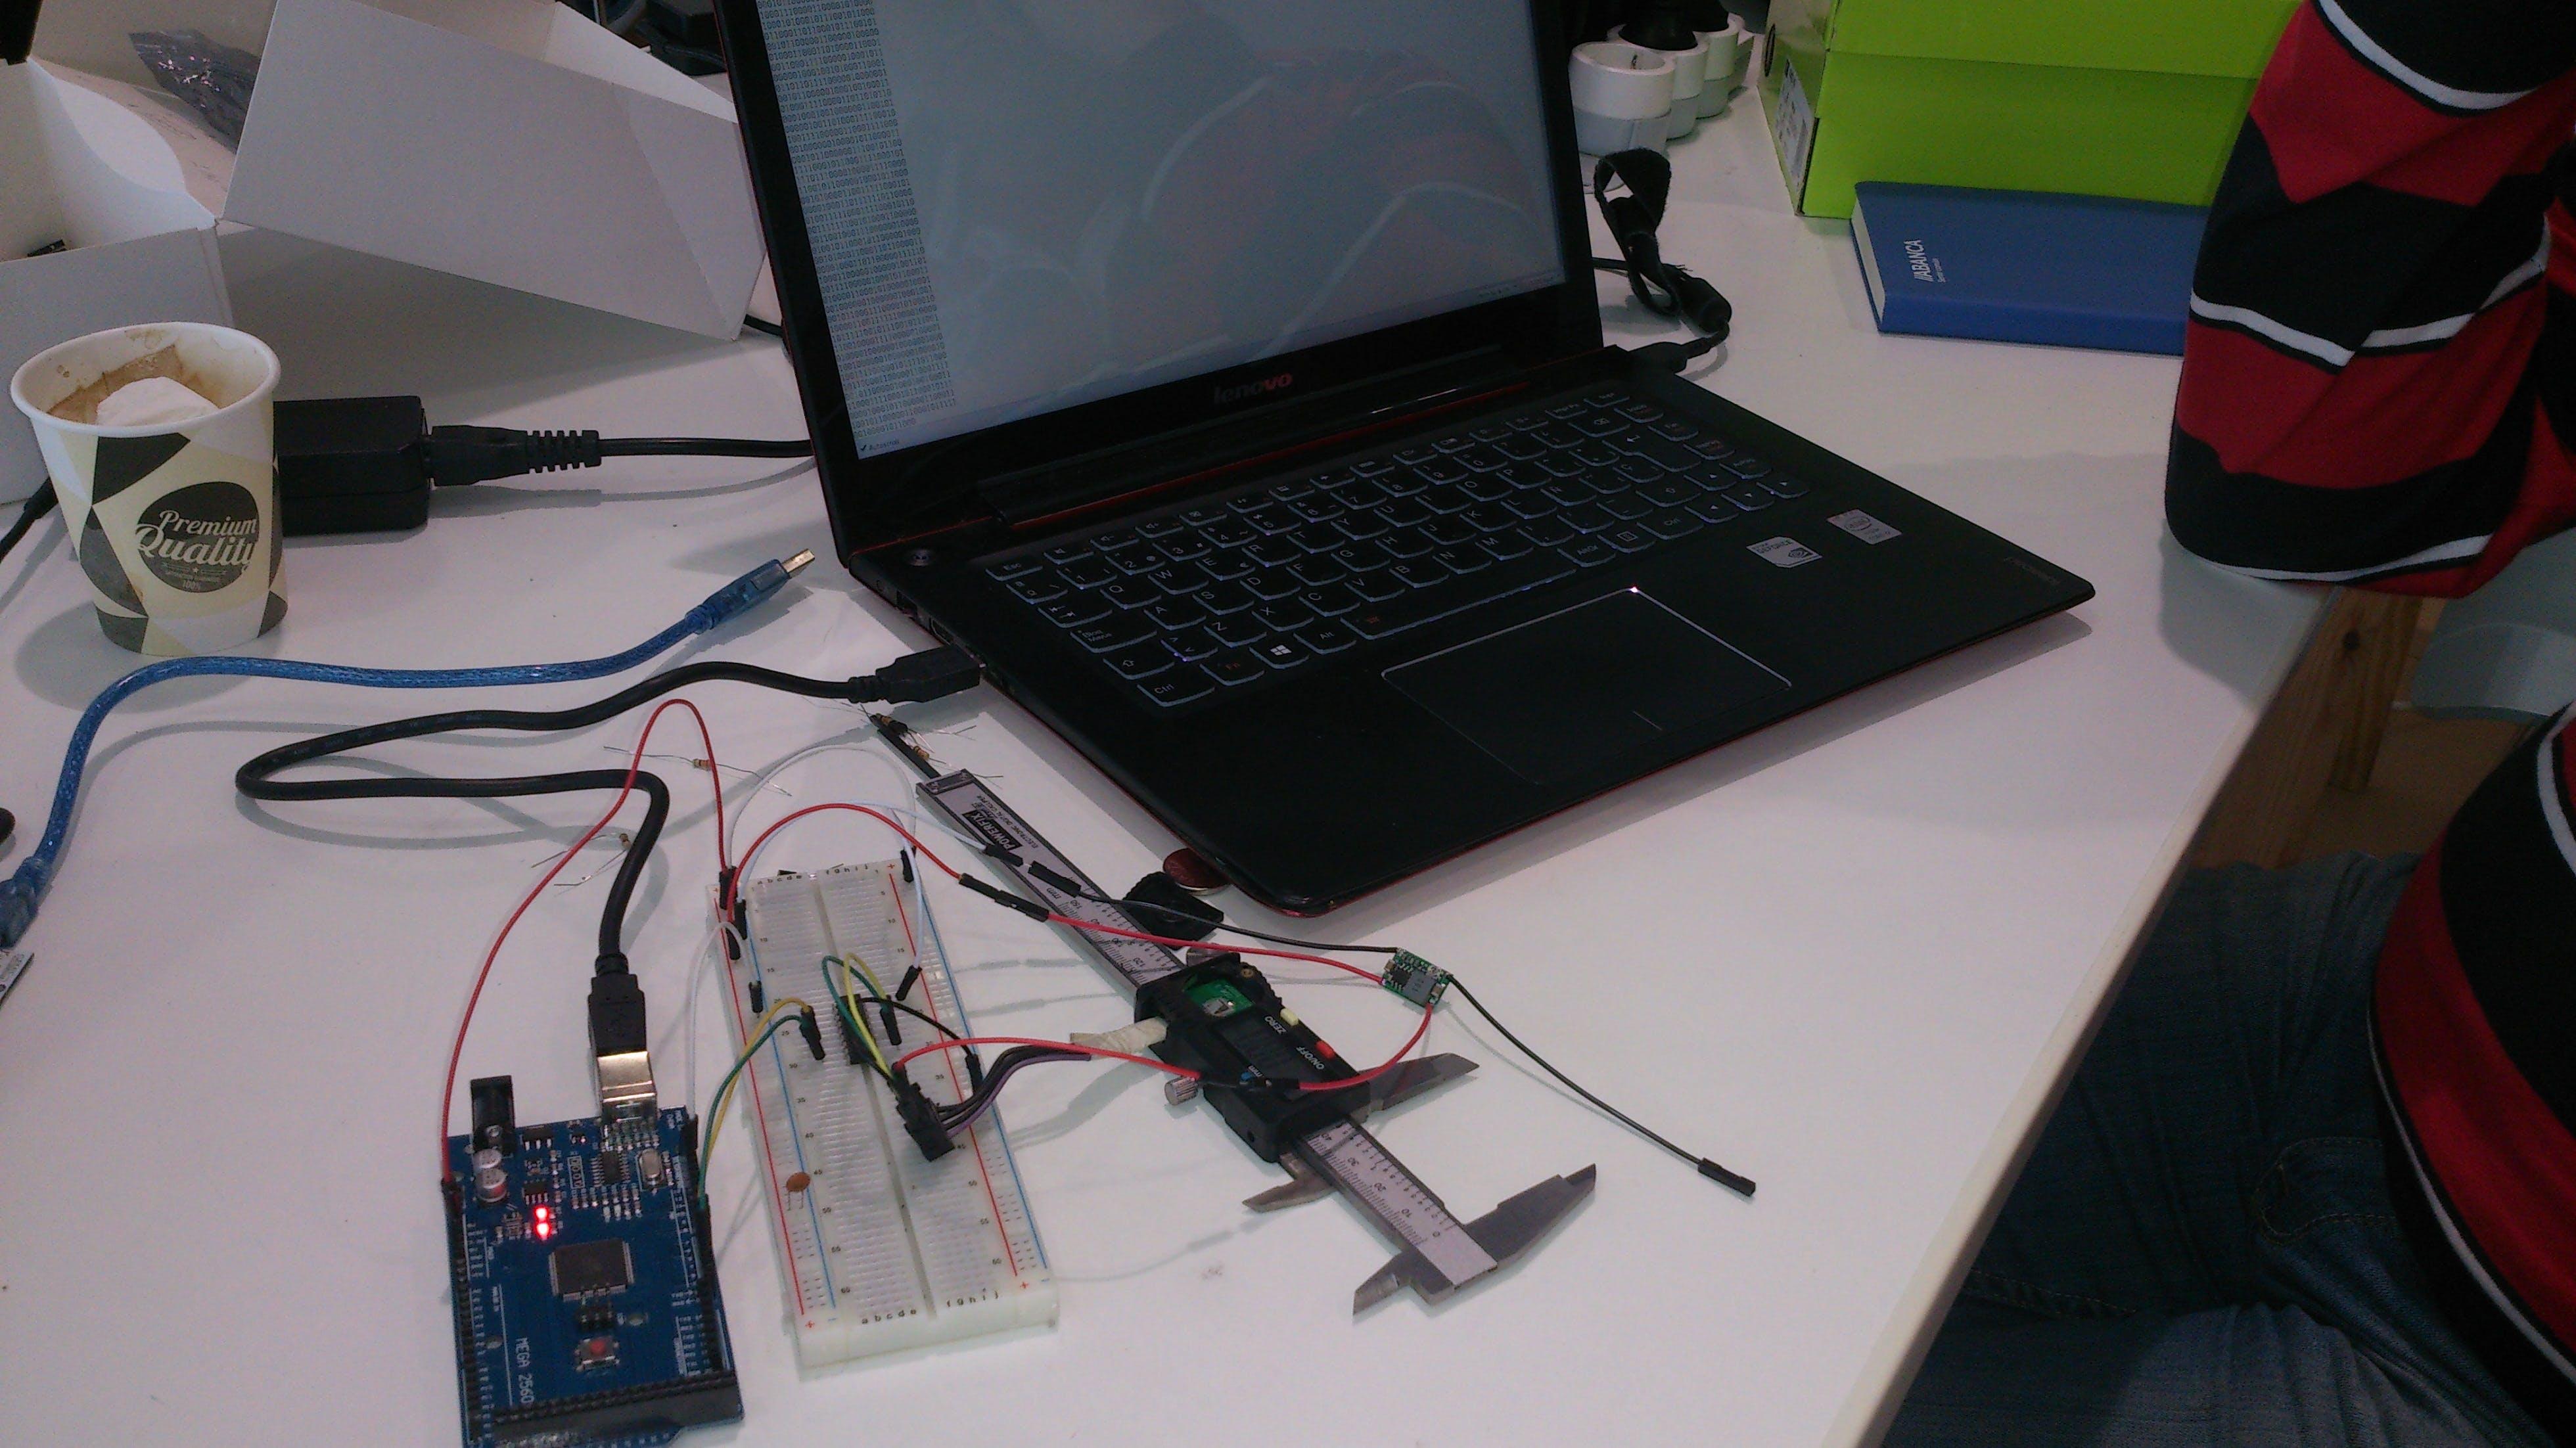 Digital ictiometer based on a accurate calliper